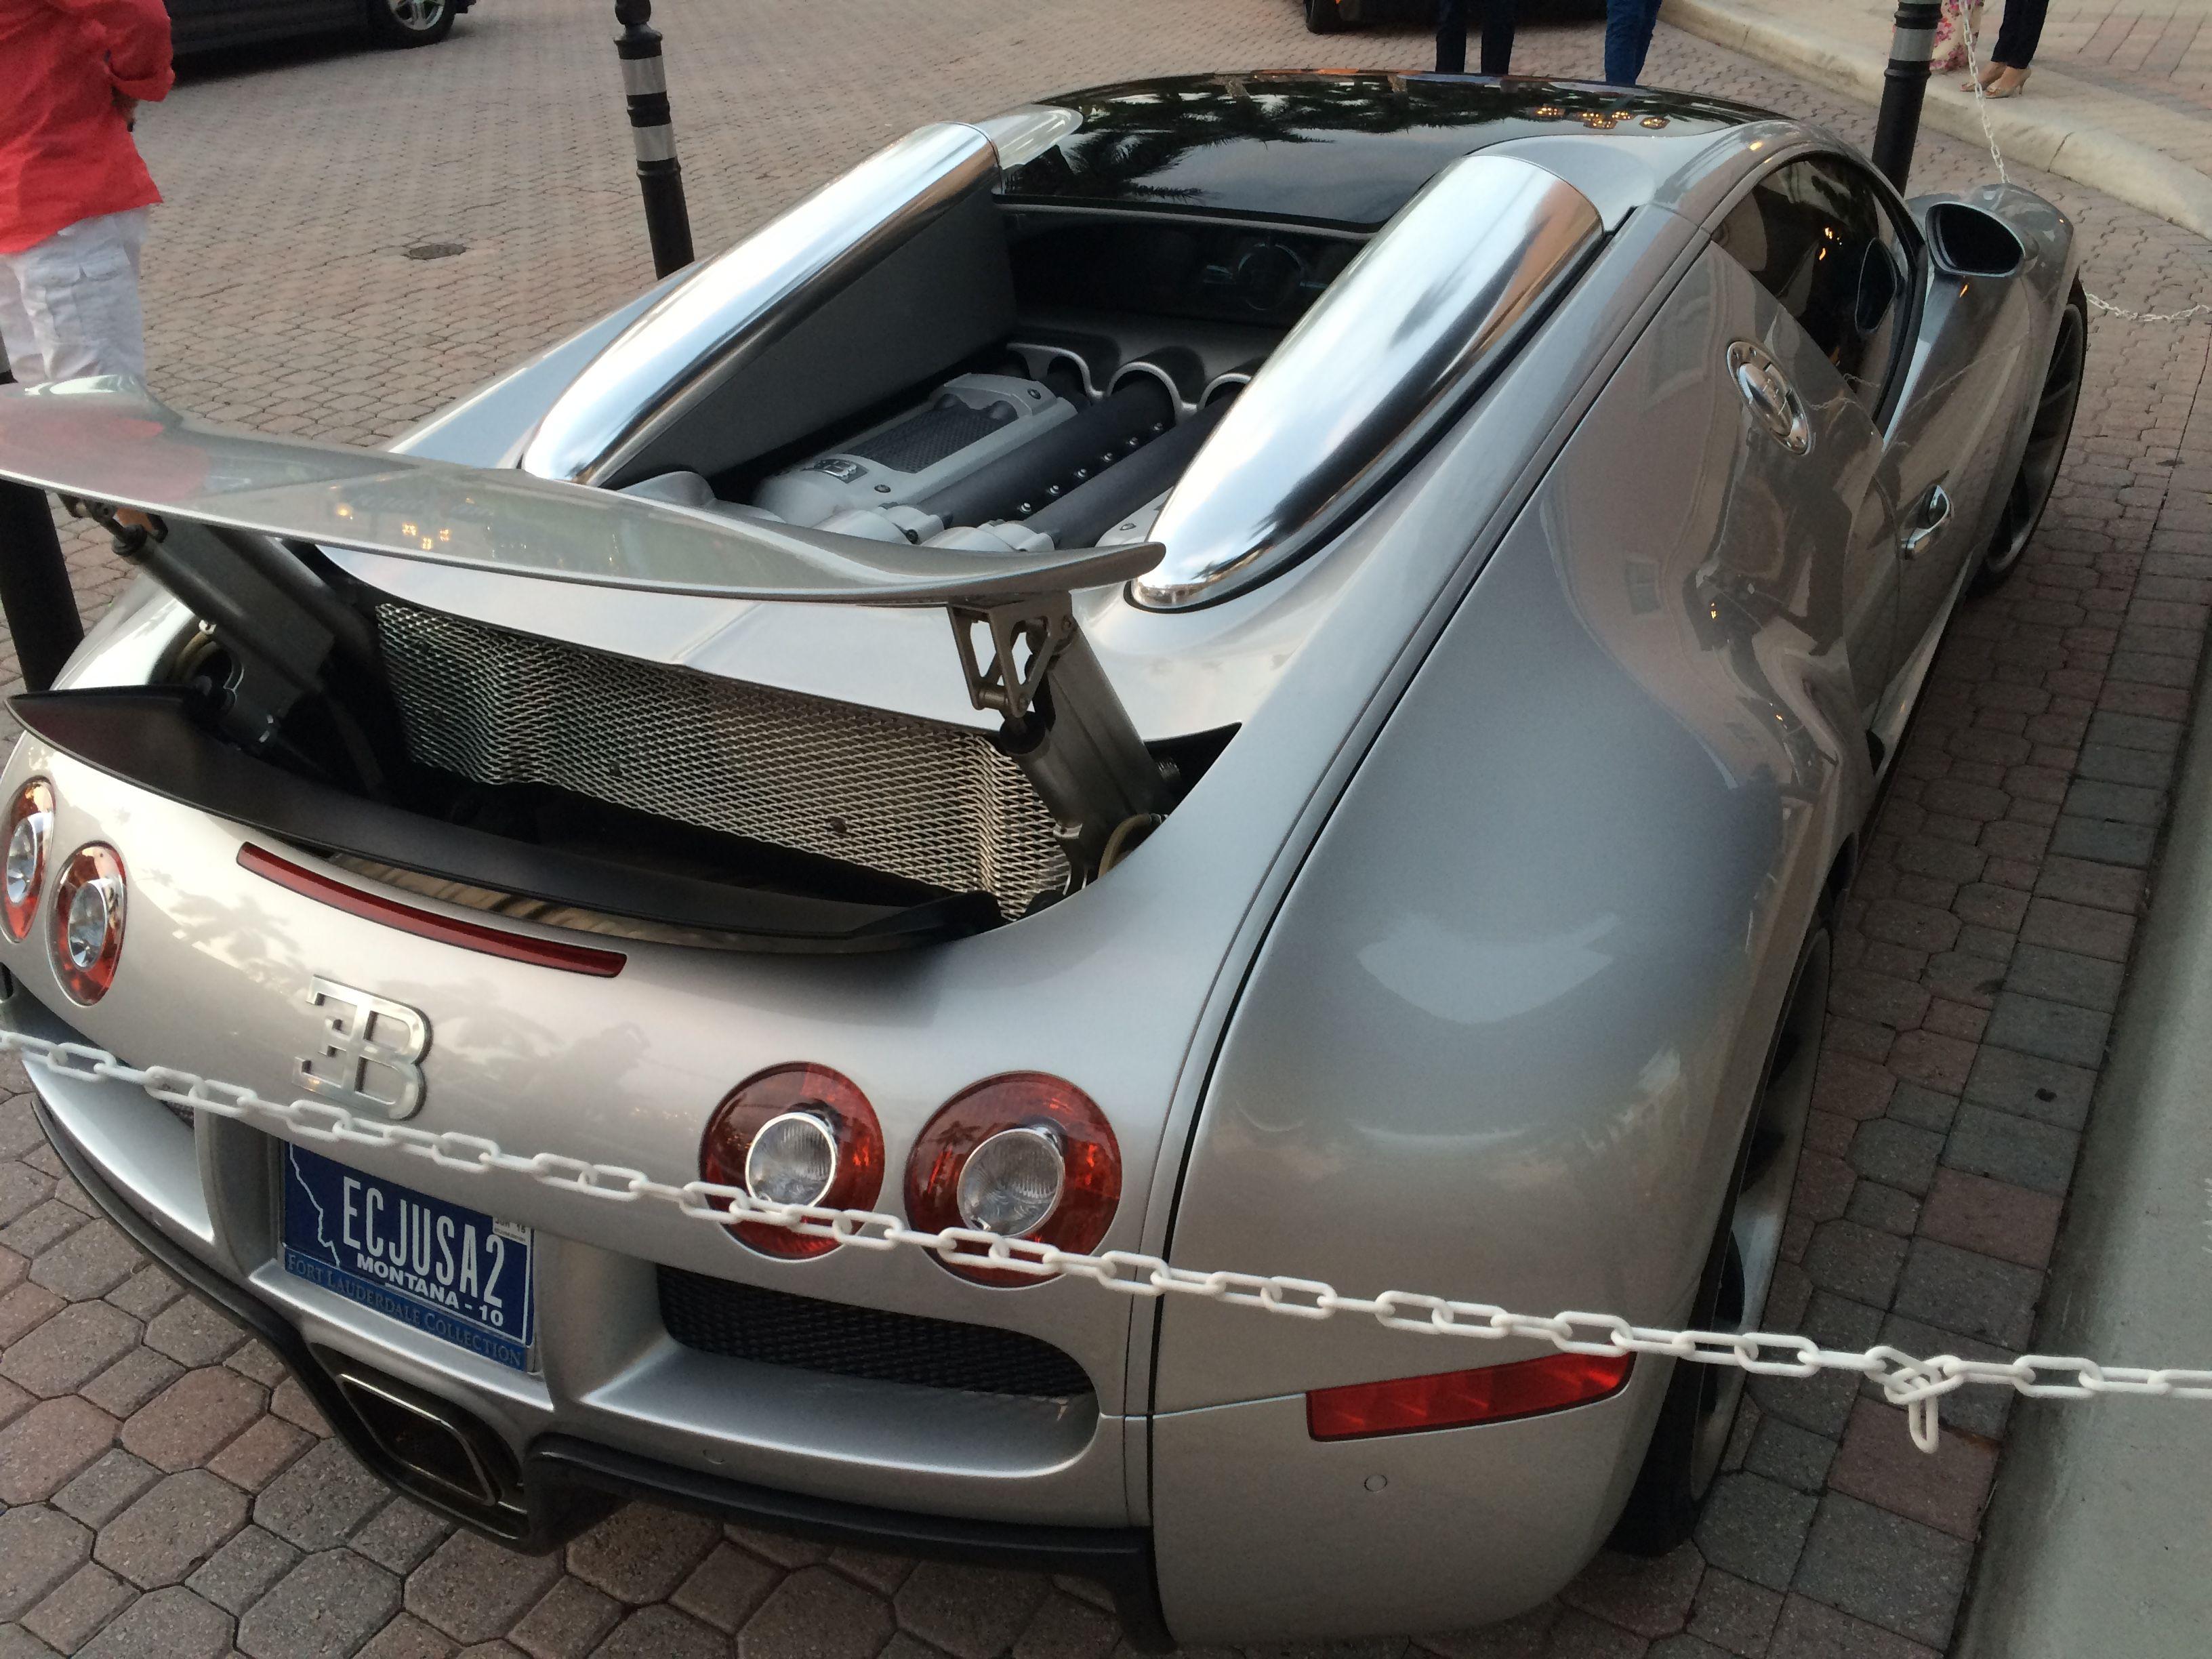 Bugatti Veyron. Mizner Park In Boca Raton, FL